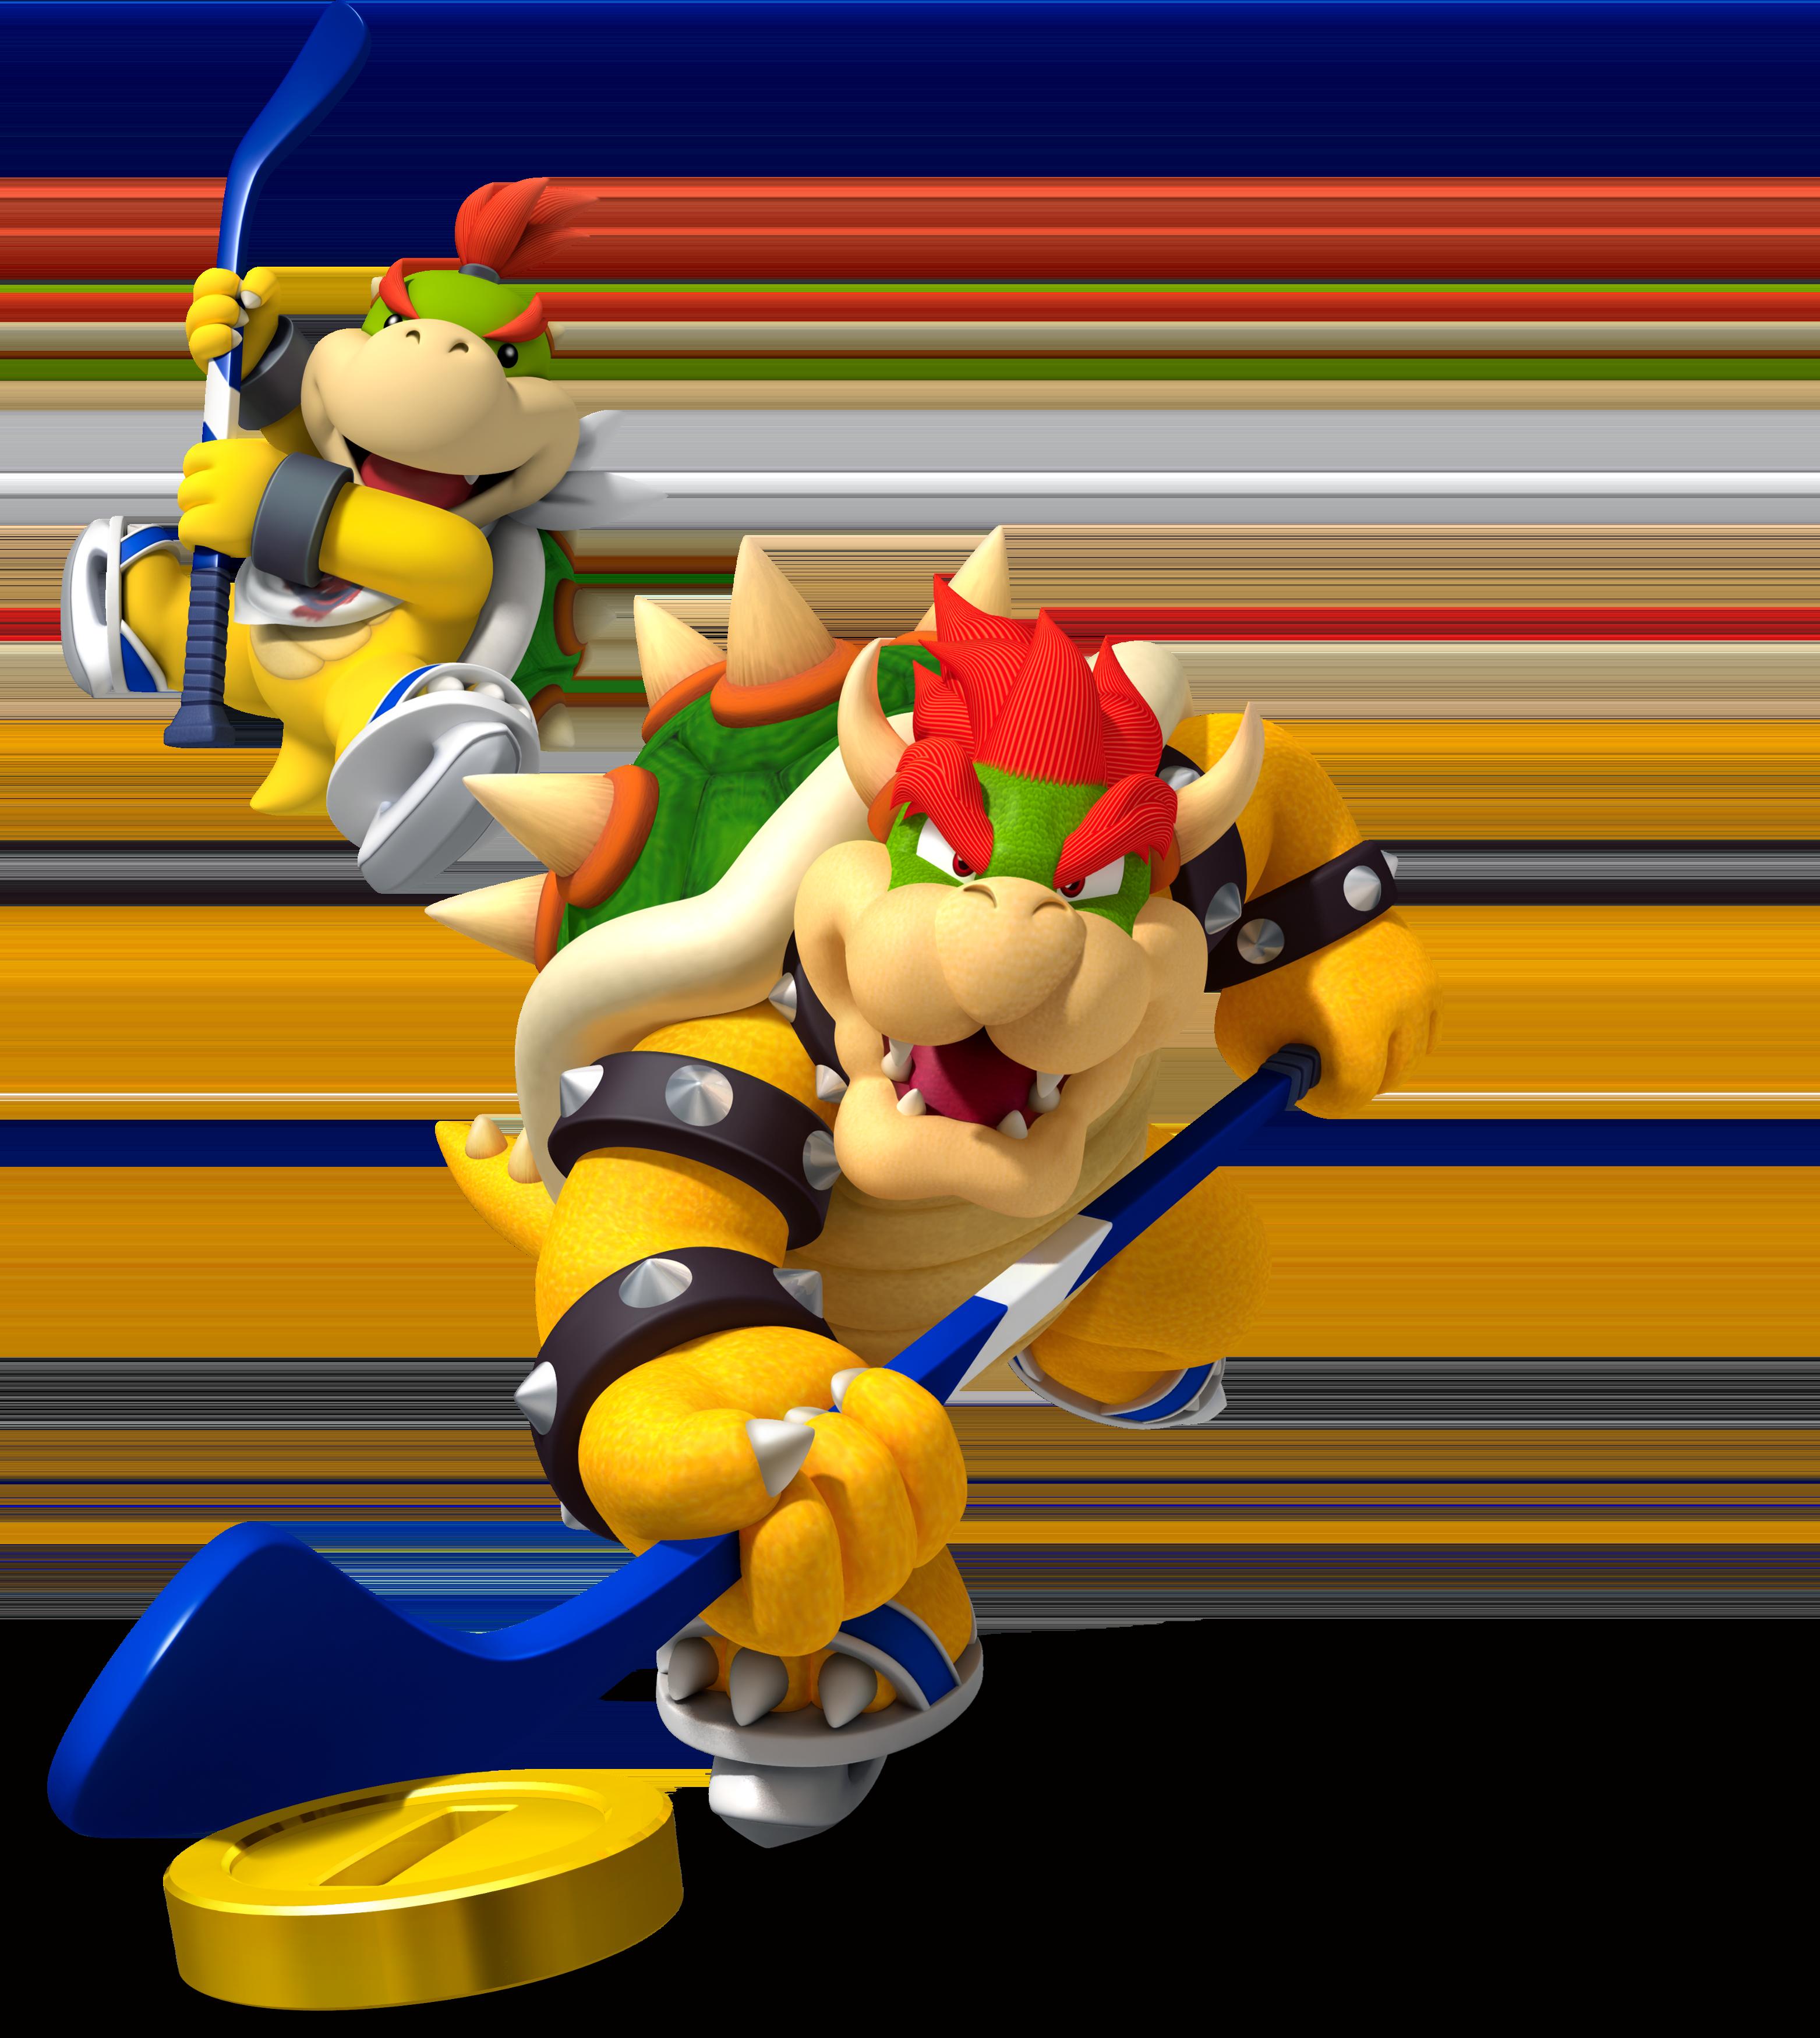 Bowser Jr Mariowiki Fandom Powered By Wikia Luigi Circuit Wii Super Mario Wiki The Encyclopedia Galaxy Bowserjrsportsmix